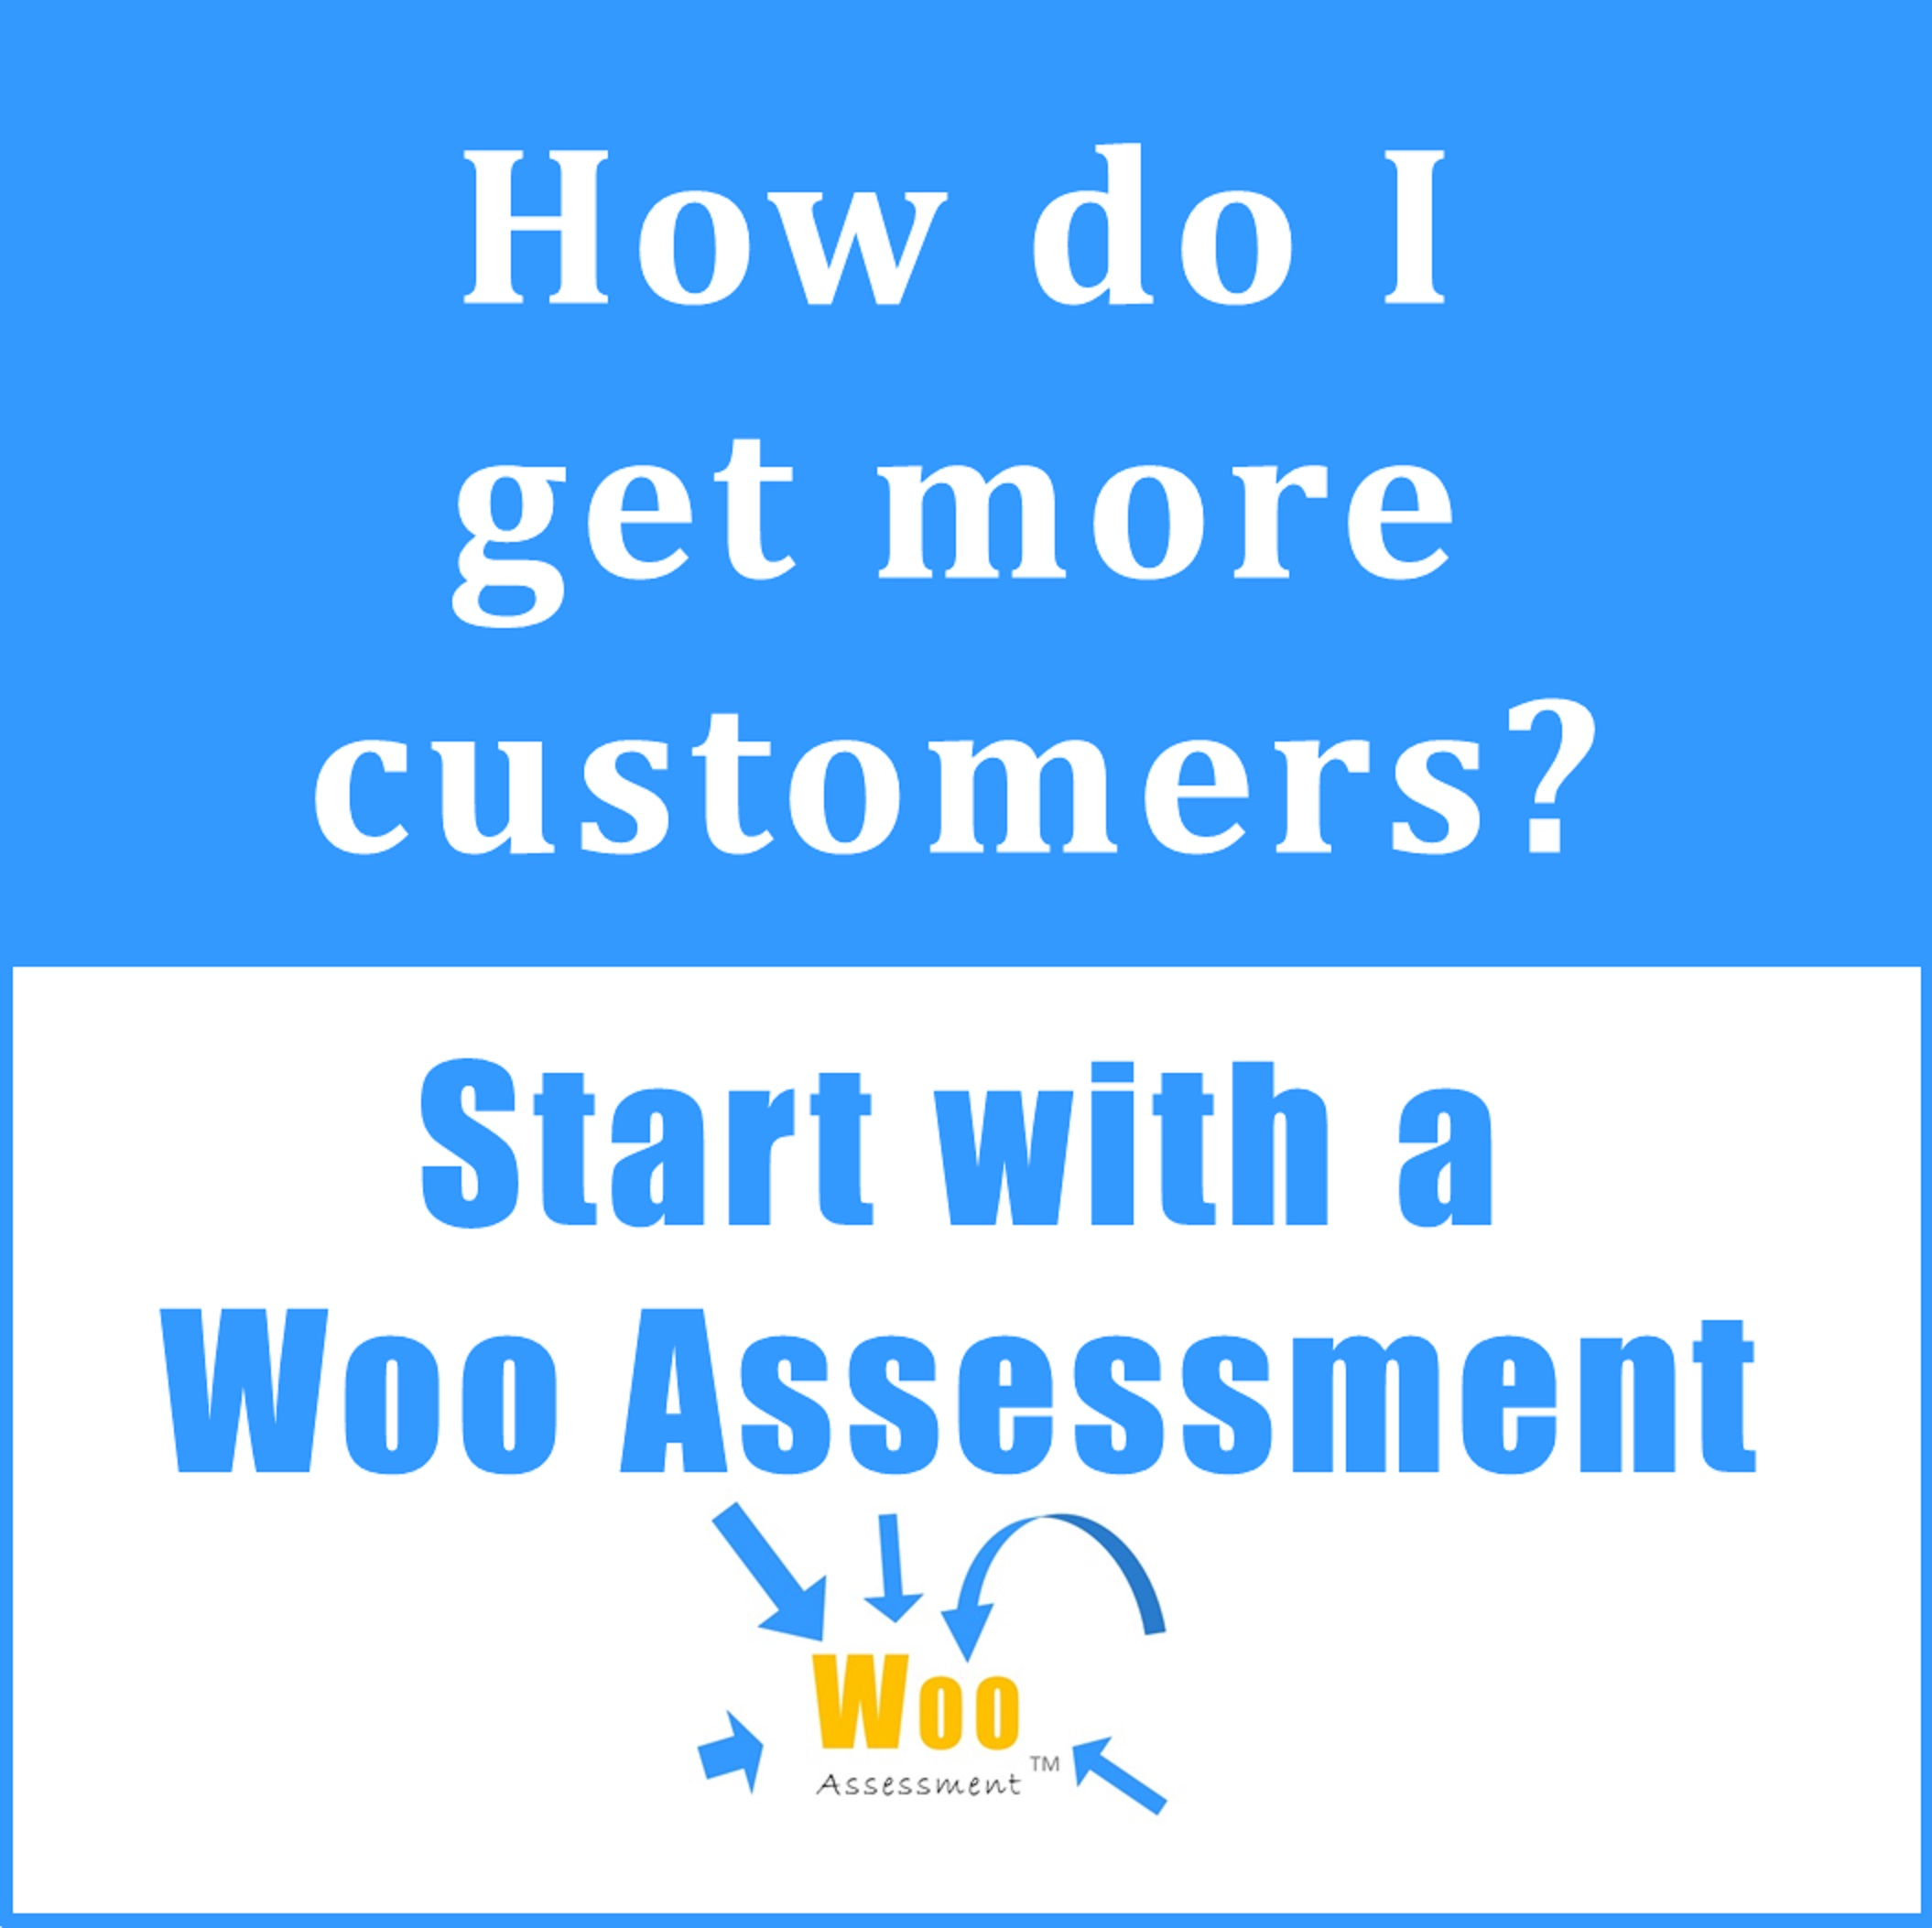 Get More Customers